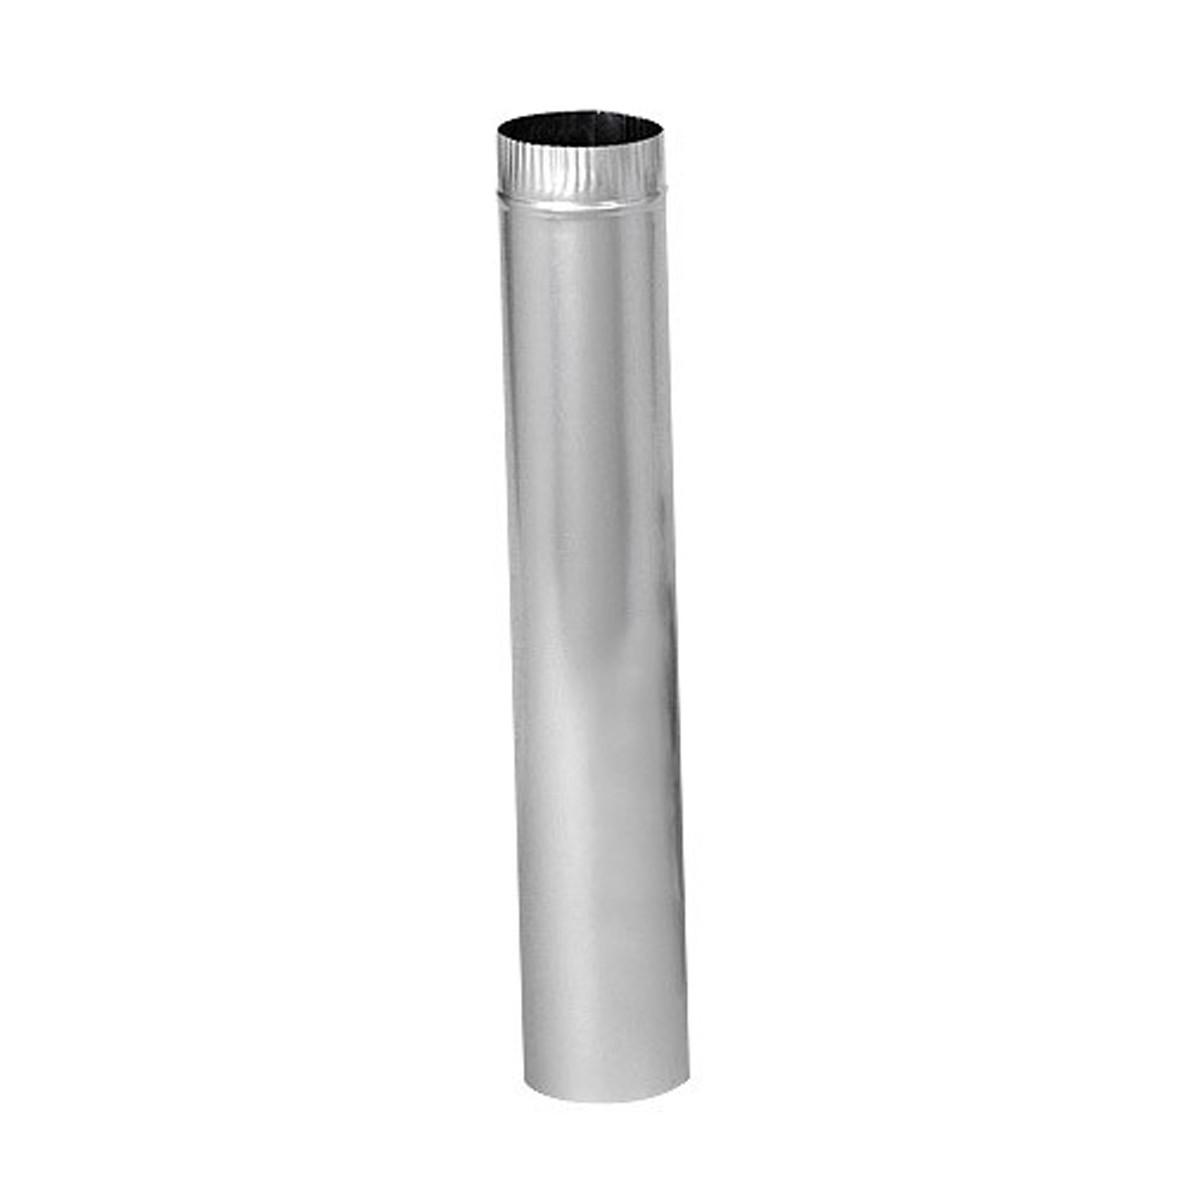 Dryer Vent Tube 3 X 5 Easy Street Material Order System